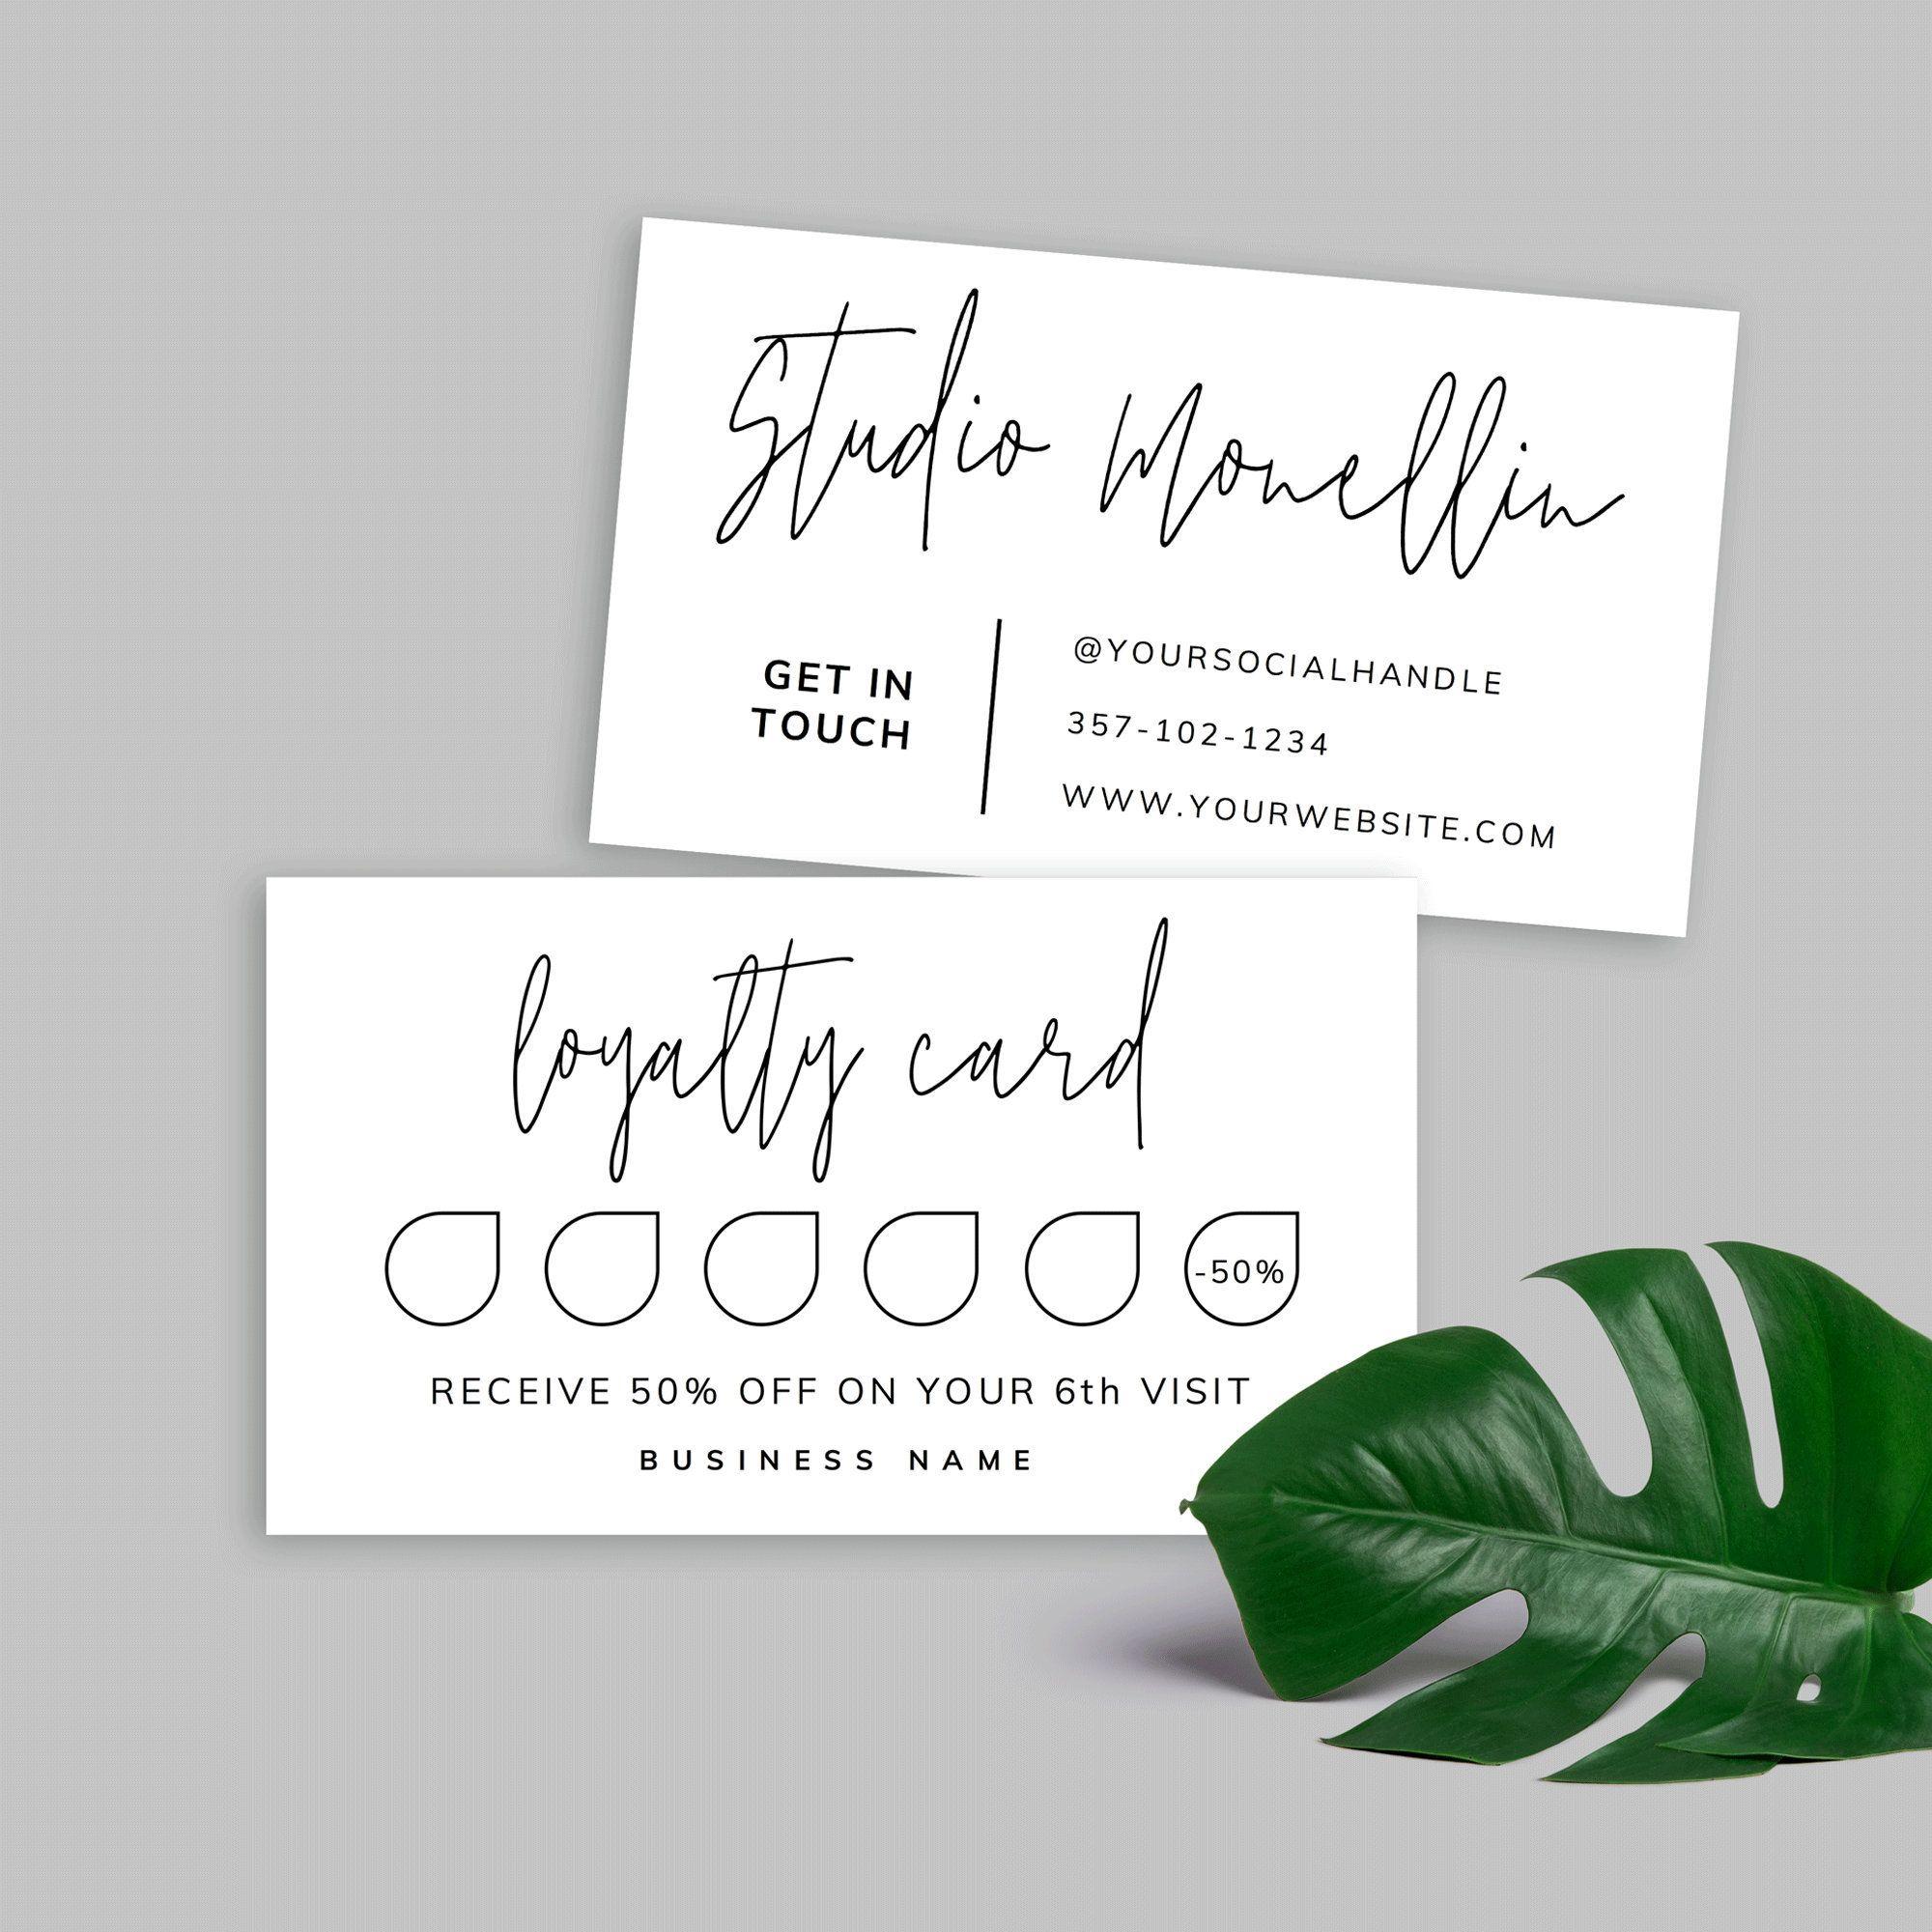 Printable Loyalty Card Simple Loyalty Card Template Etsy Loyalty Card Template Card Template Printable Gift Cards